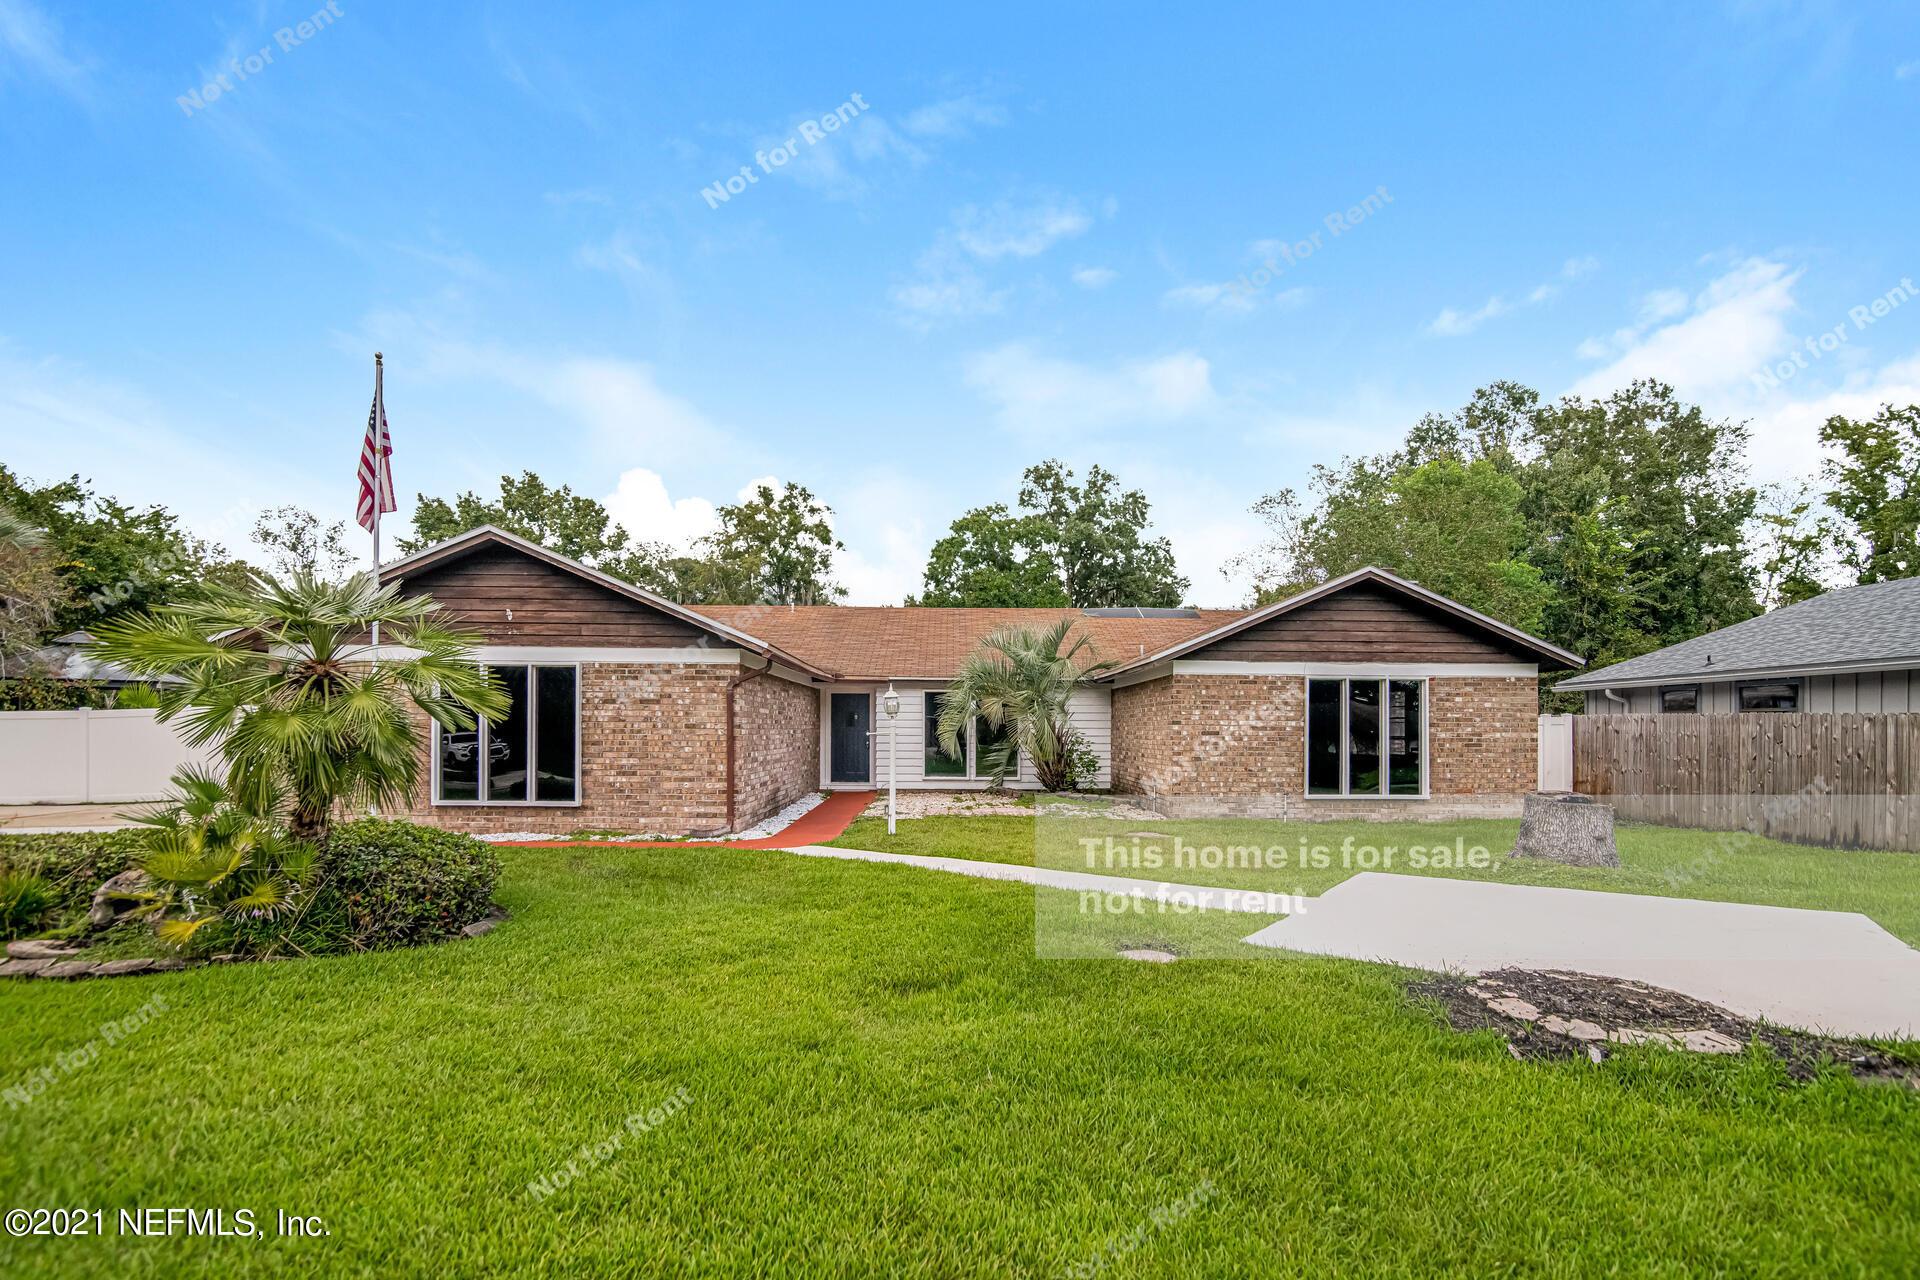 1499 ST FRANCIS, ORANGE PARK, FLORIDA 32073, 3 Bedrooms Bedrooms, ,2 BathroomsBathrooms,Residential,For sale,ST FRANCIS,1133310